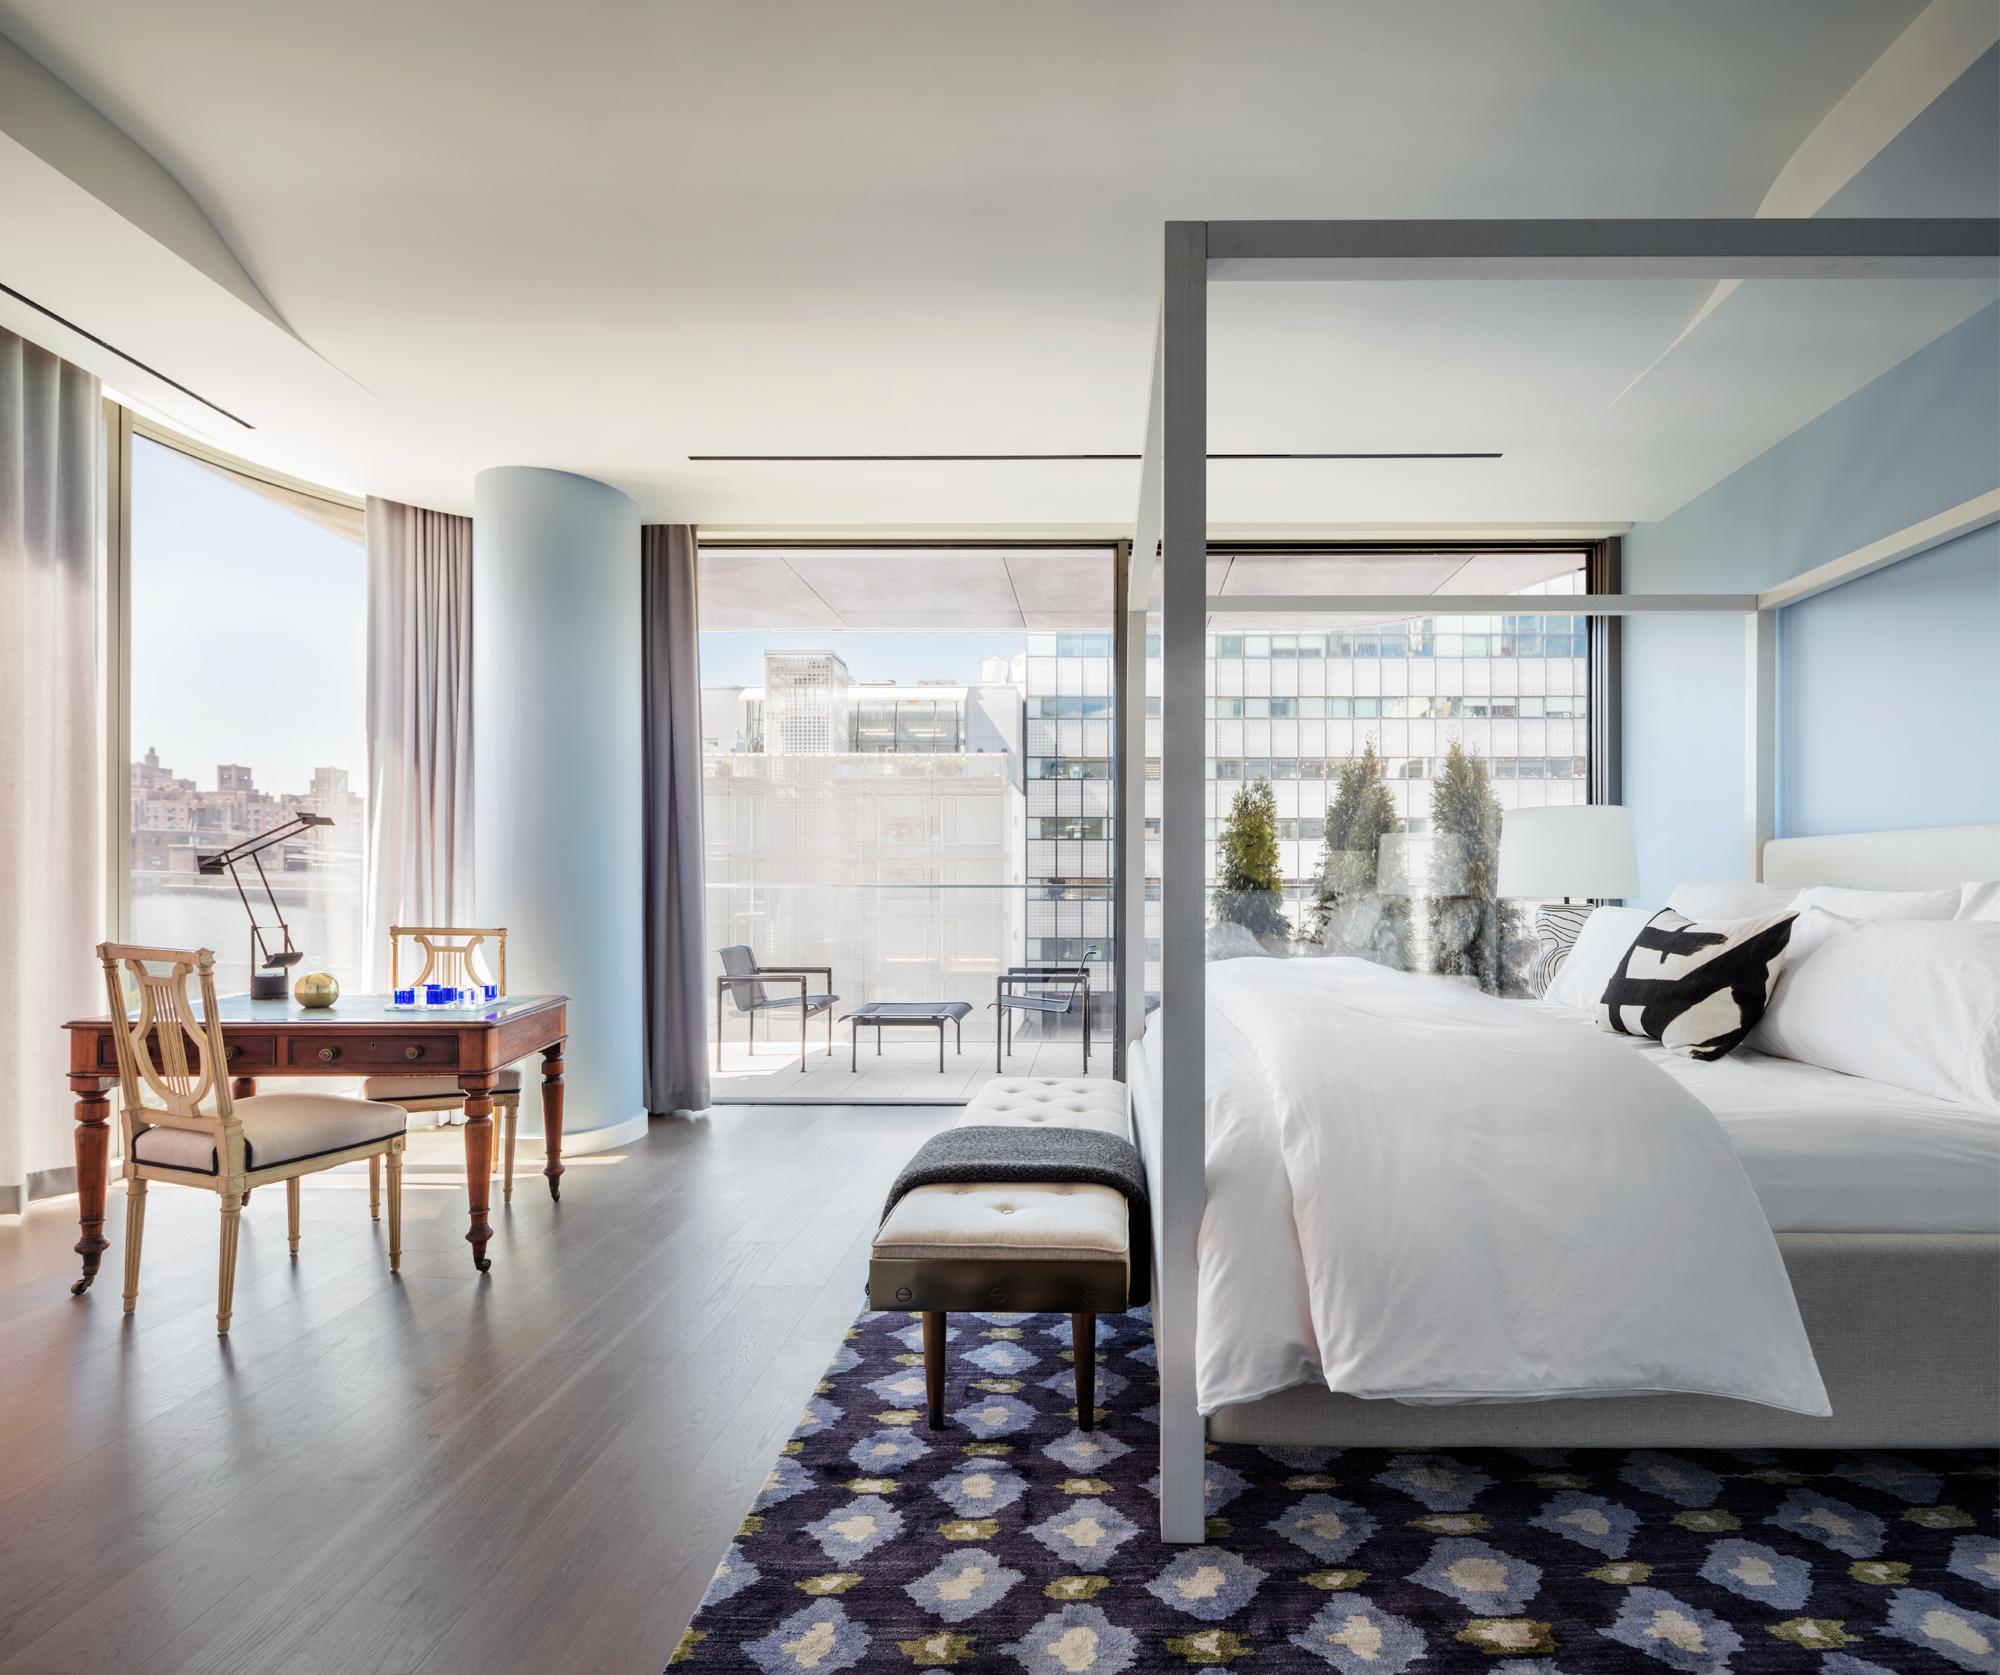 Zaha Hadid's High Line-hugging condo unveils a new model home